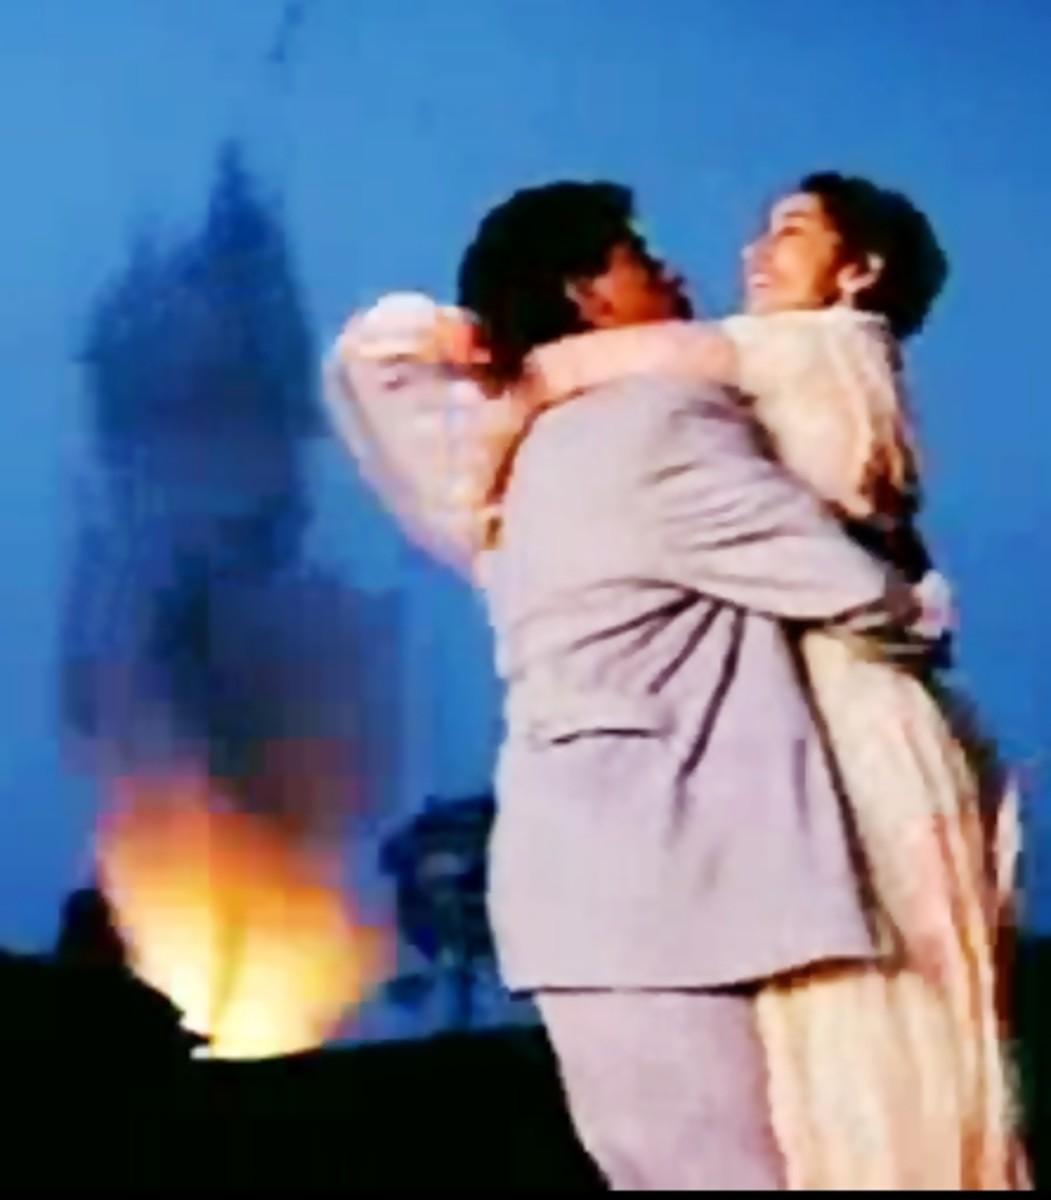 A R Rahman: The modern melody of Bollywood